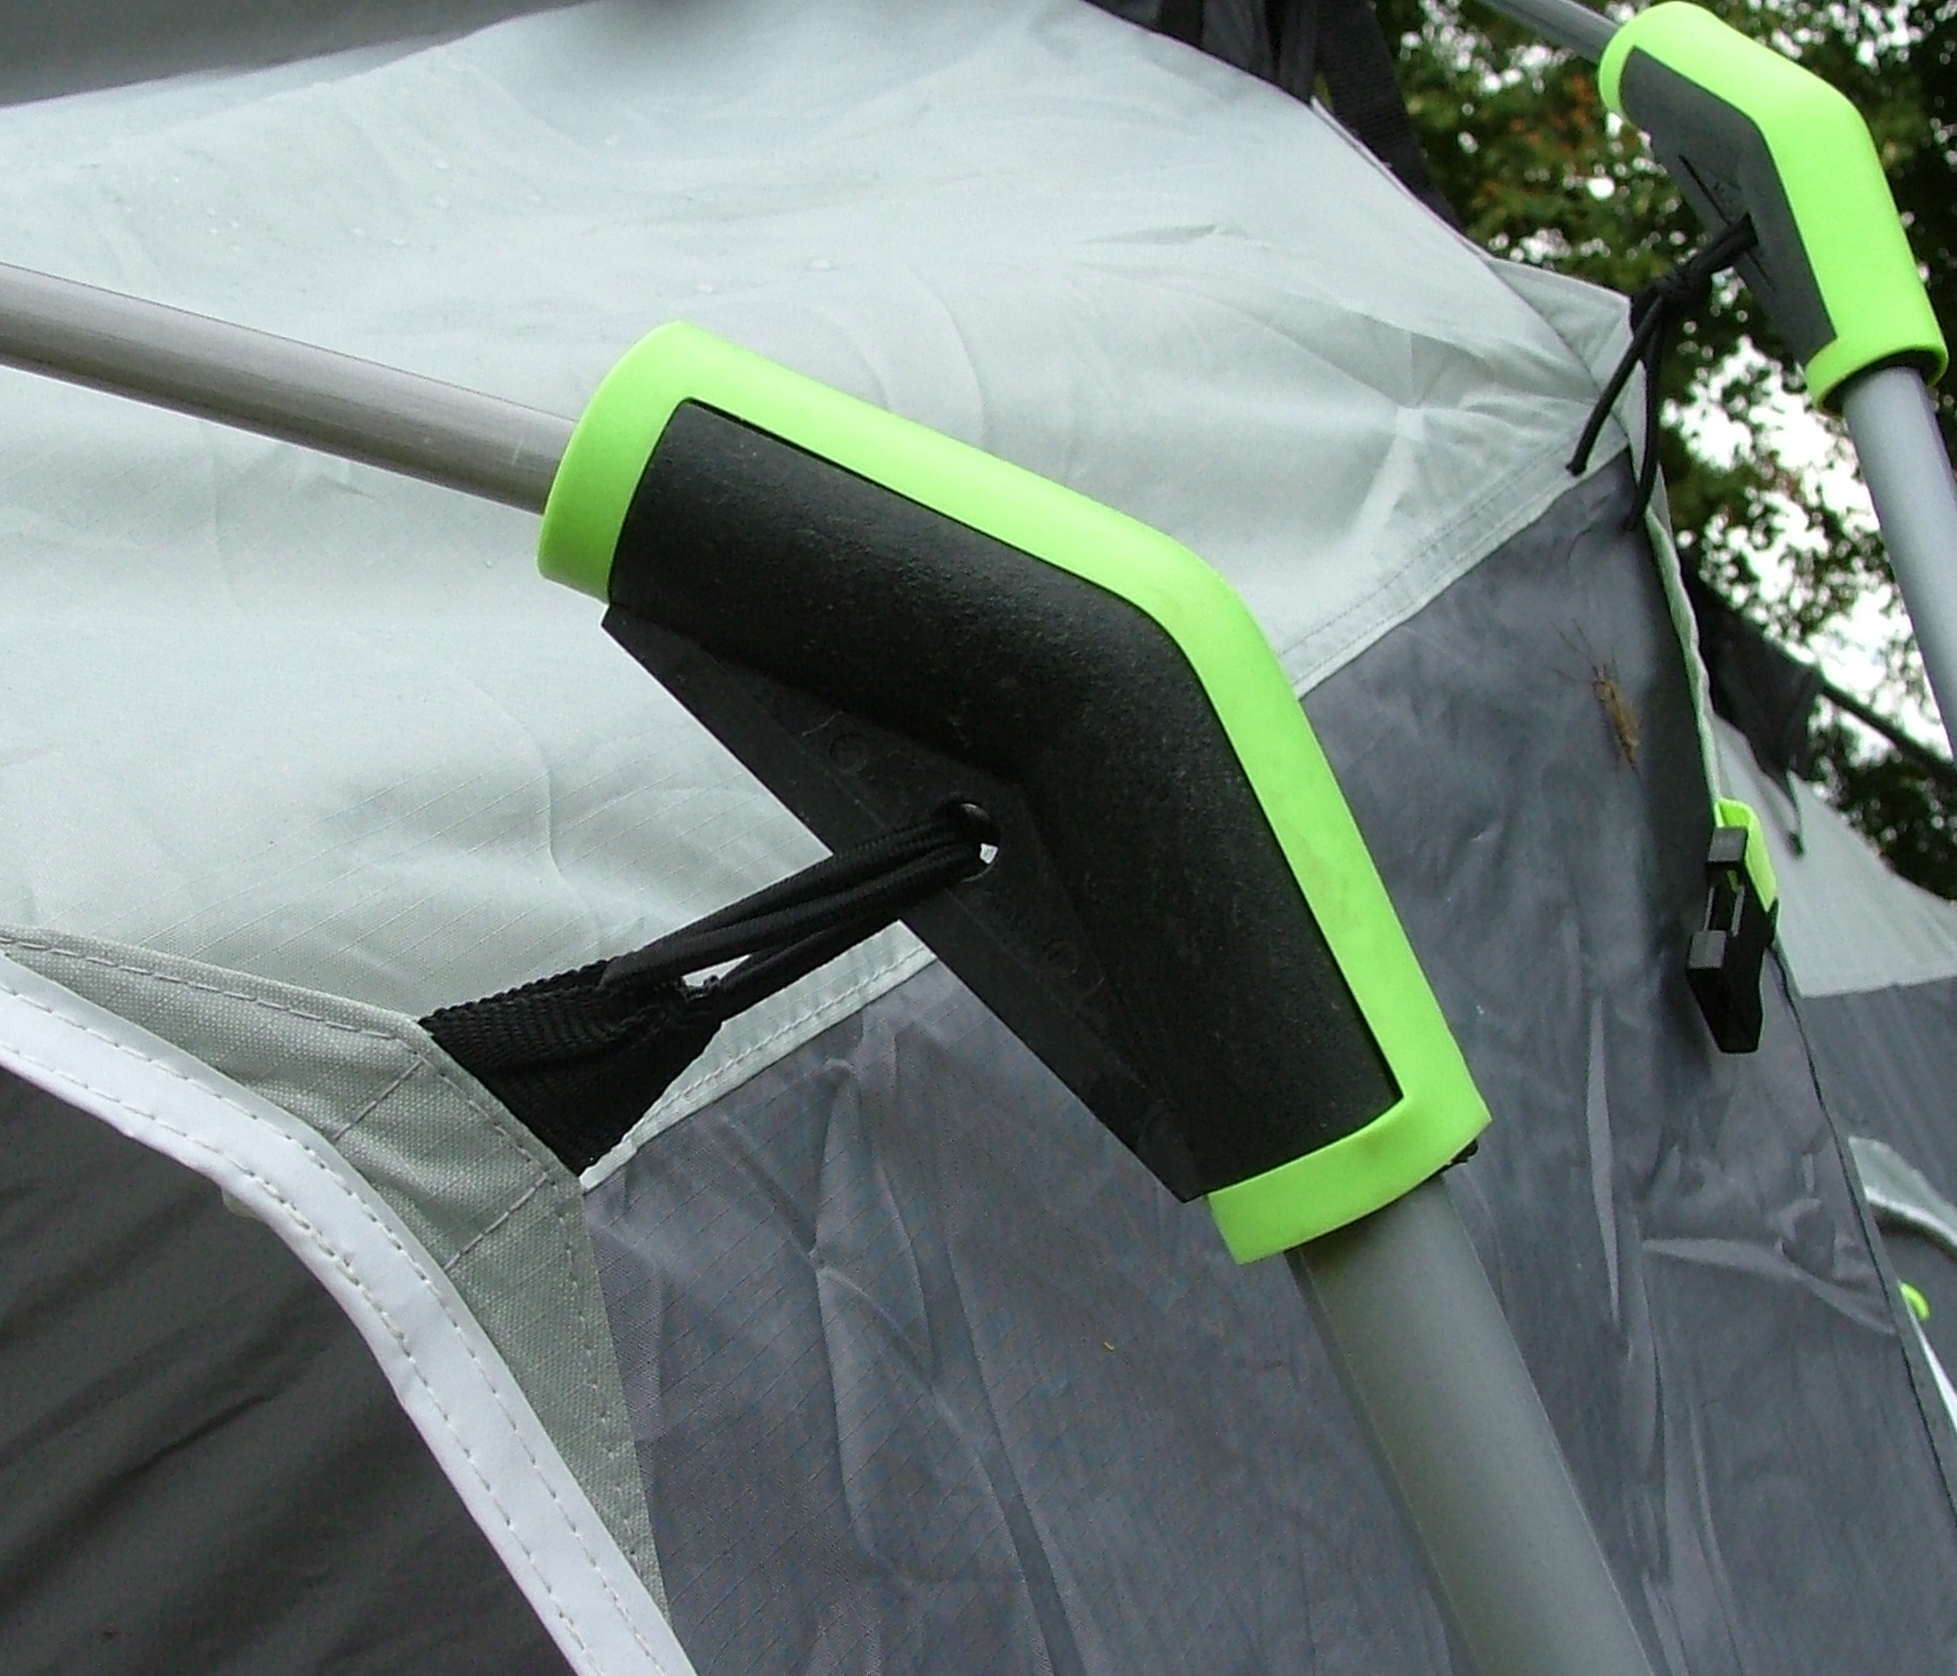 2014 Driveaway-awnings - driveaway-awnings.co.uk